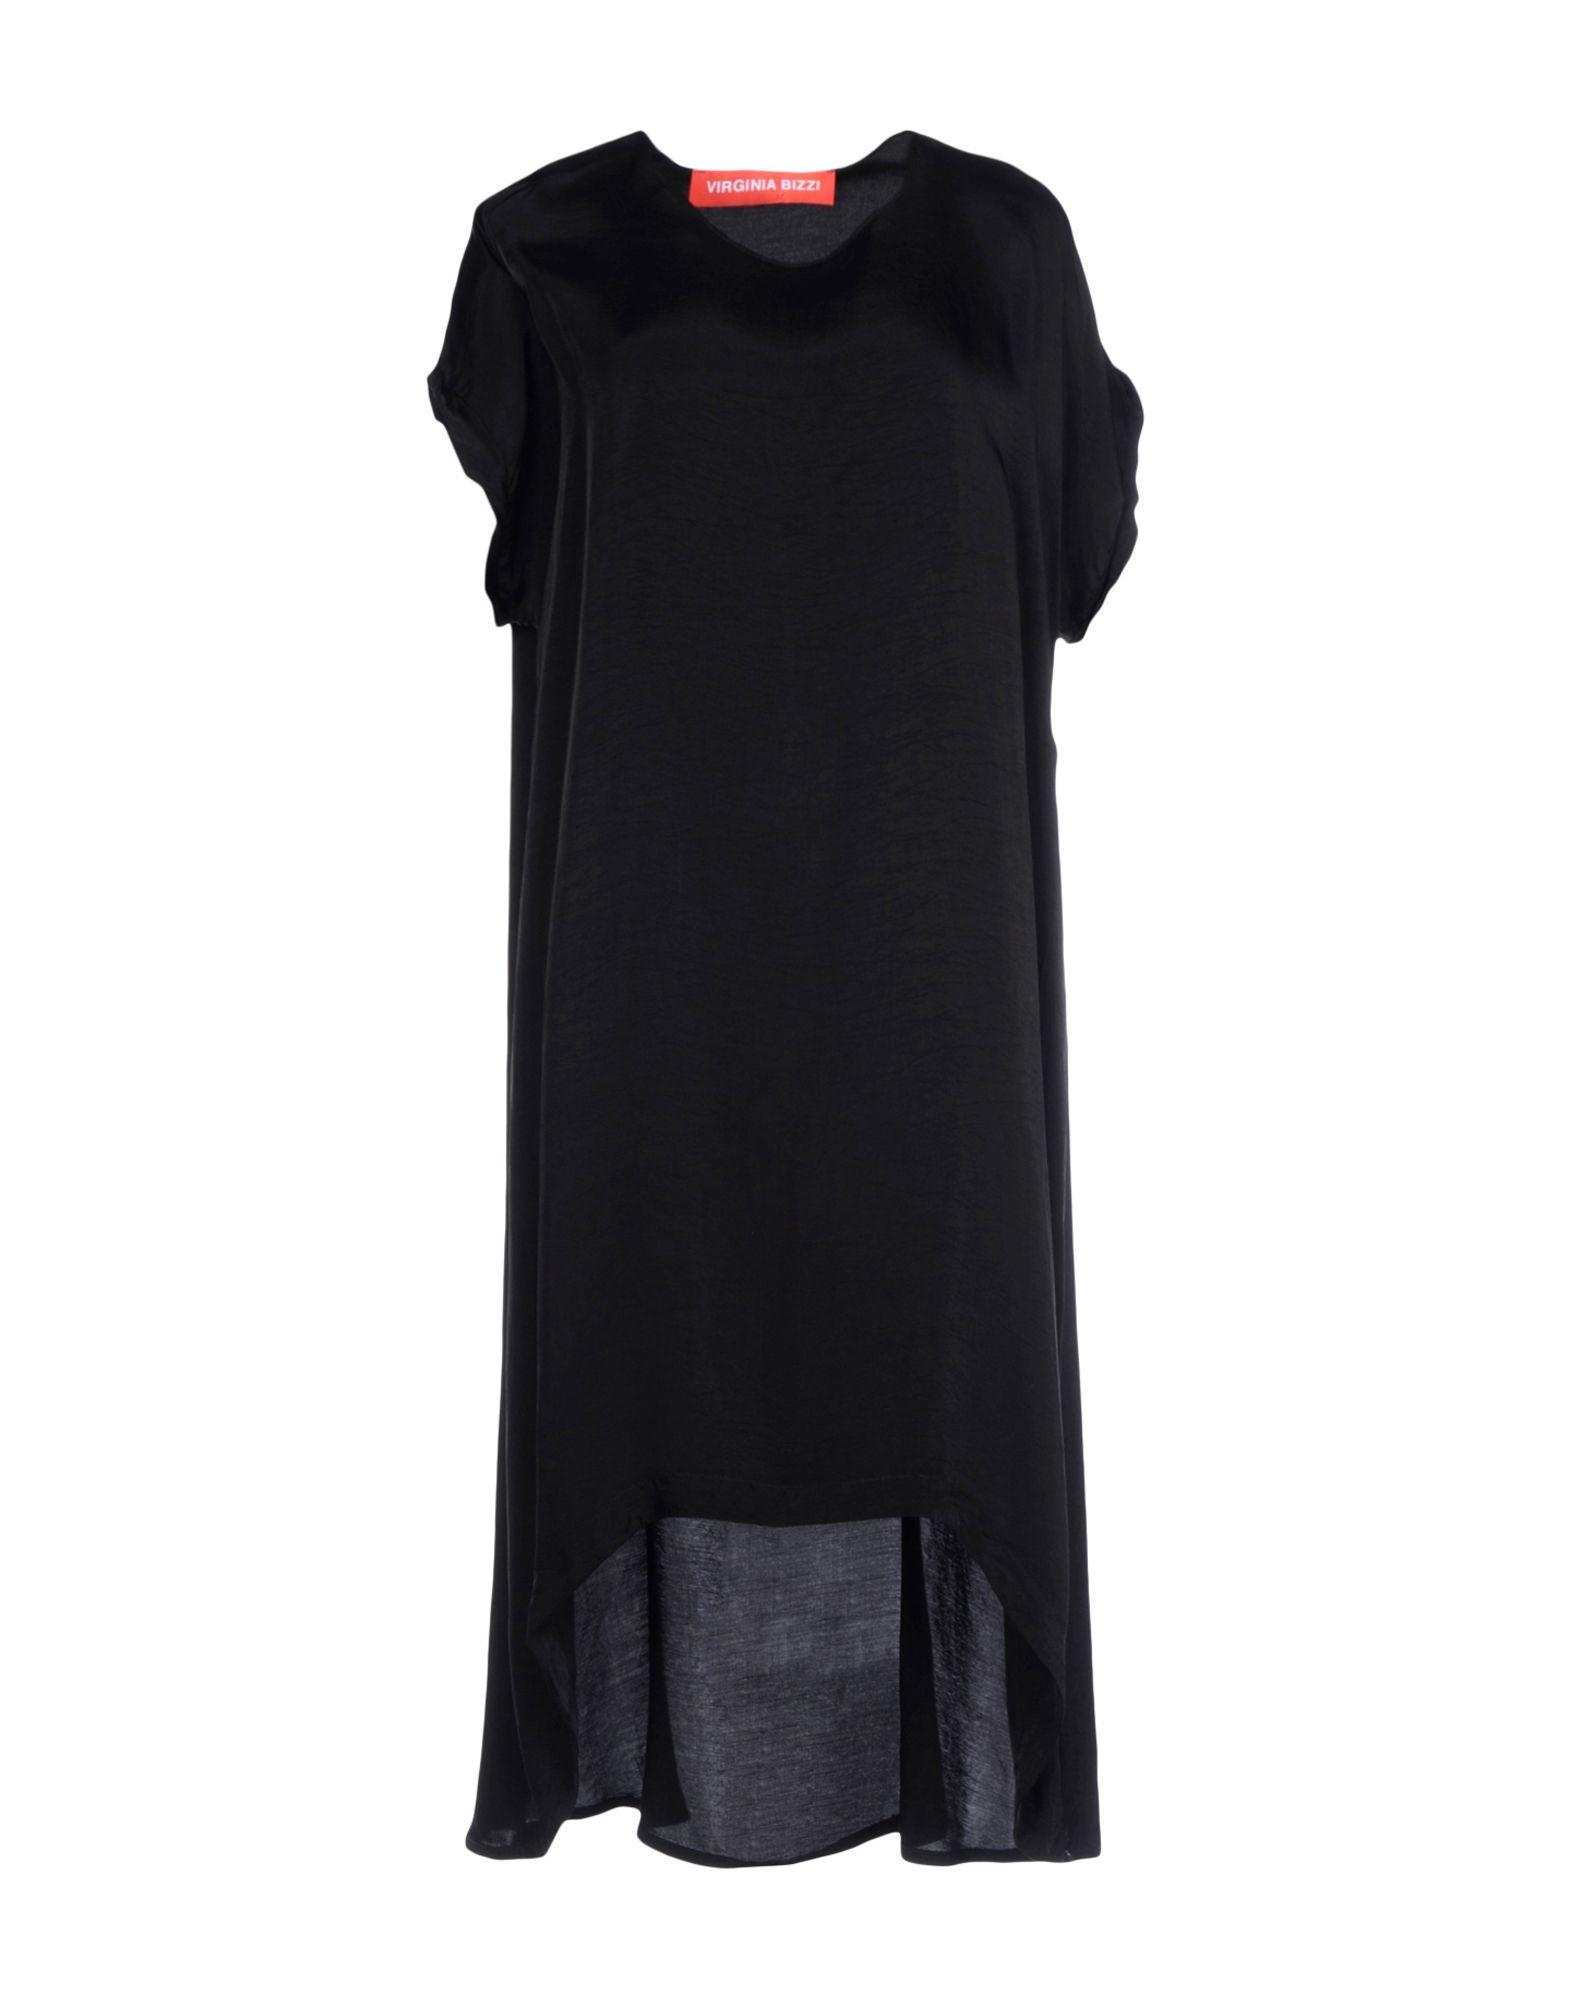 VIRGINIA BIZZI Платье до колена